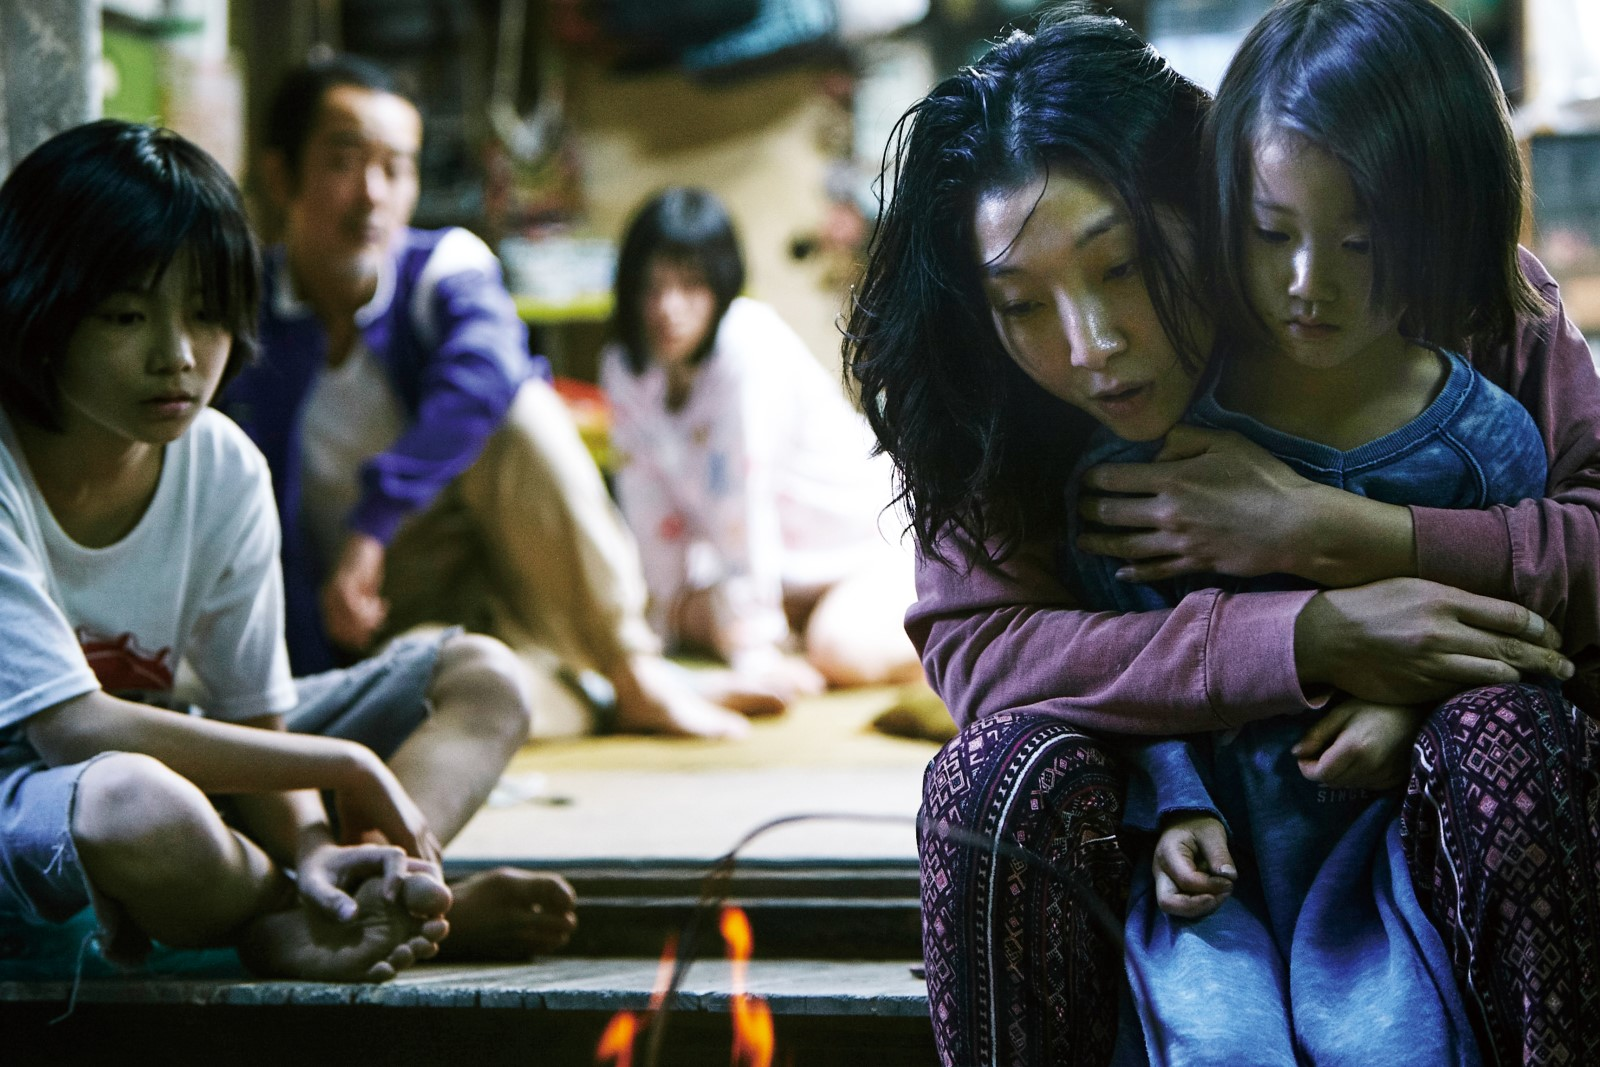 Directed by Hirokazu Kore-eda